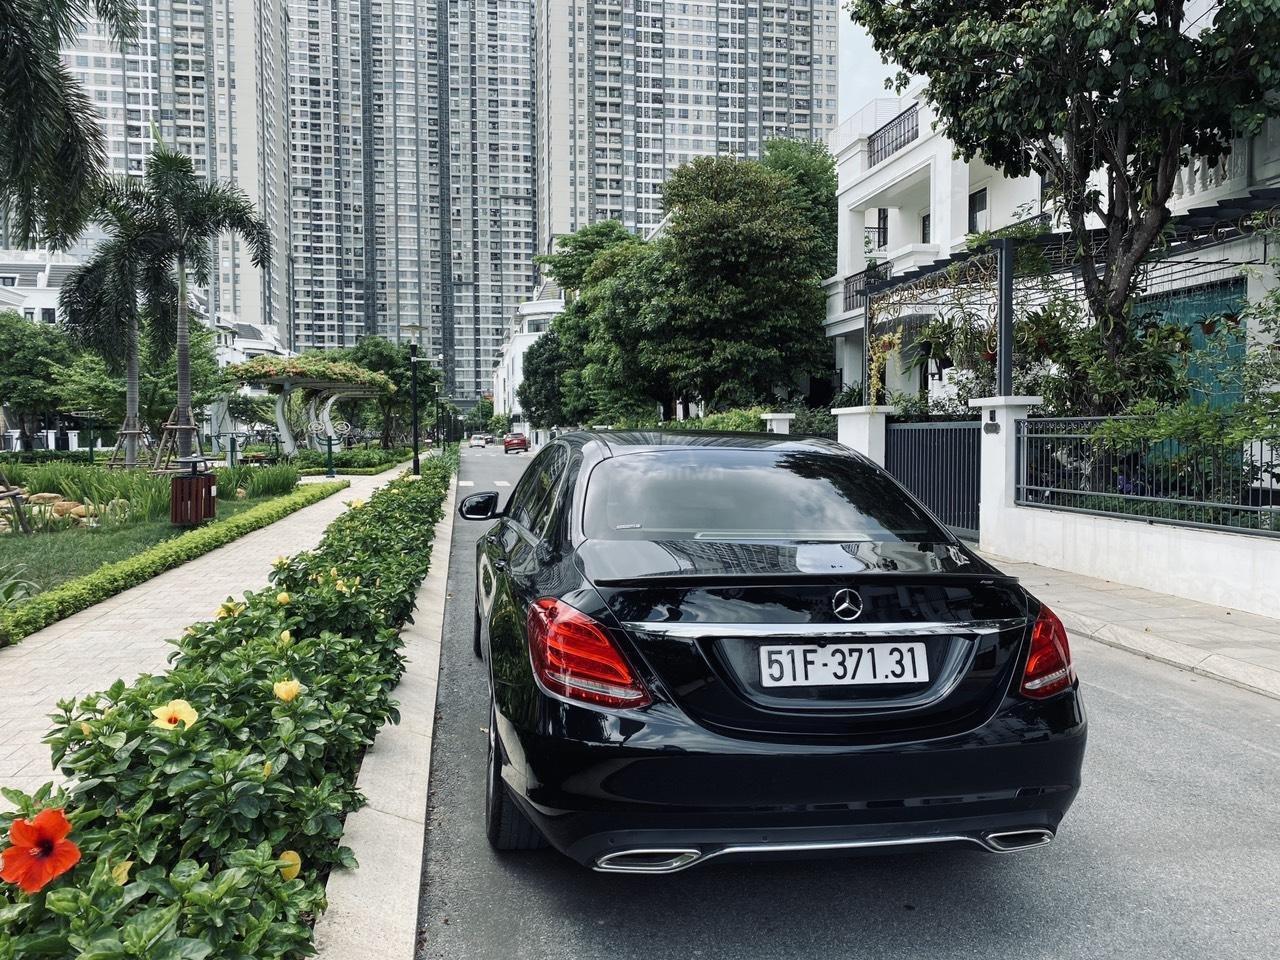 Mercedes C200 sx 2015, đk 2016, màu đen, nội thất kem (4)